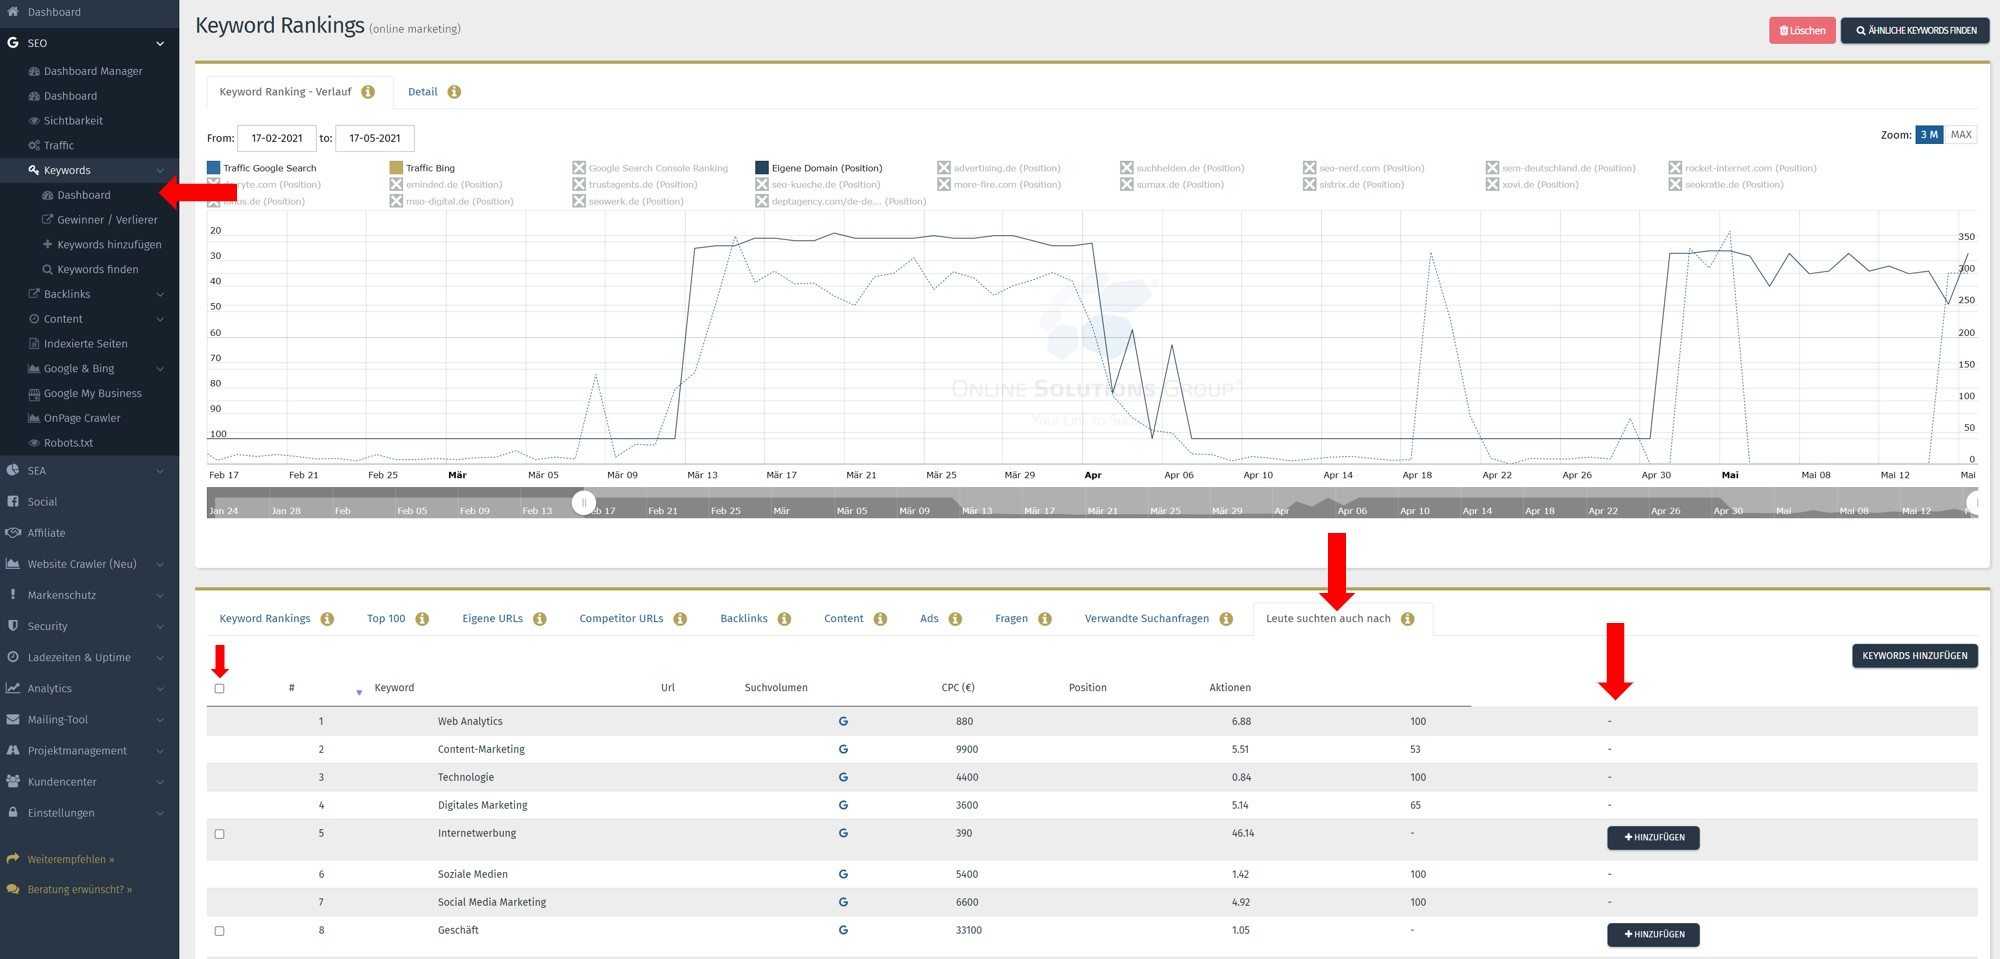 SEO Content Tool Performance Suite Leute suchten auch nach